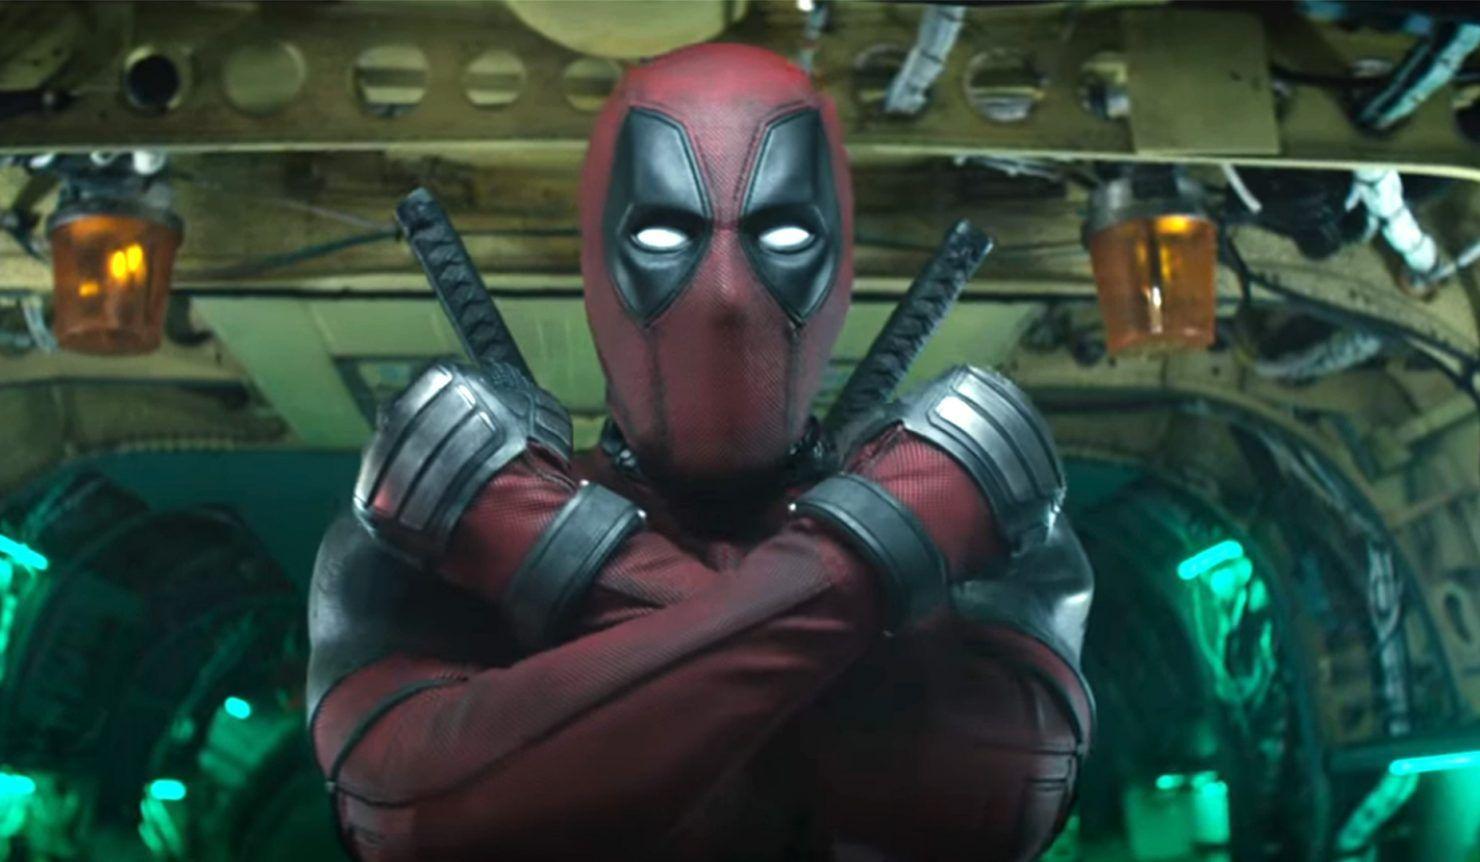 Deadpool 2 Spoiler X Men Fénix Oscura - Muertes Personajes